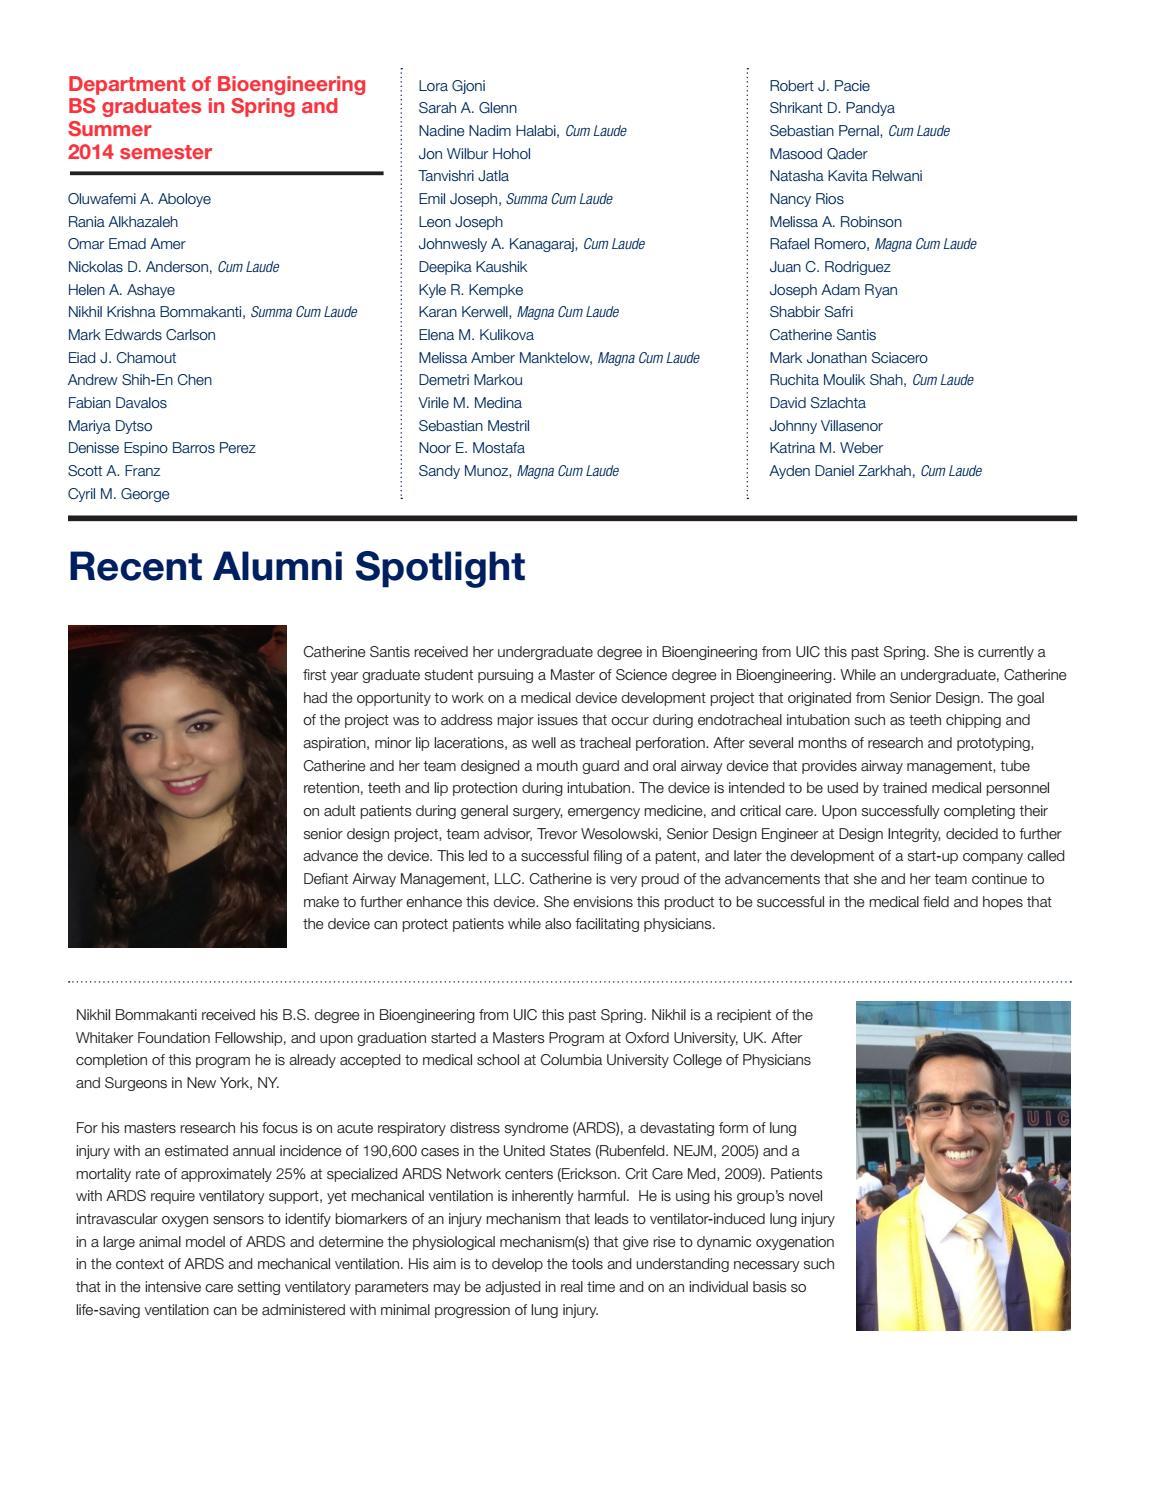 UIC Bioengineering Fall 2014 Newsletter by UIC College of